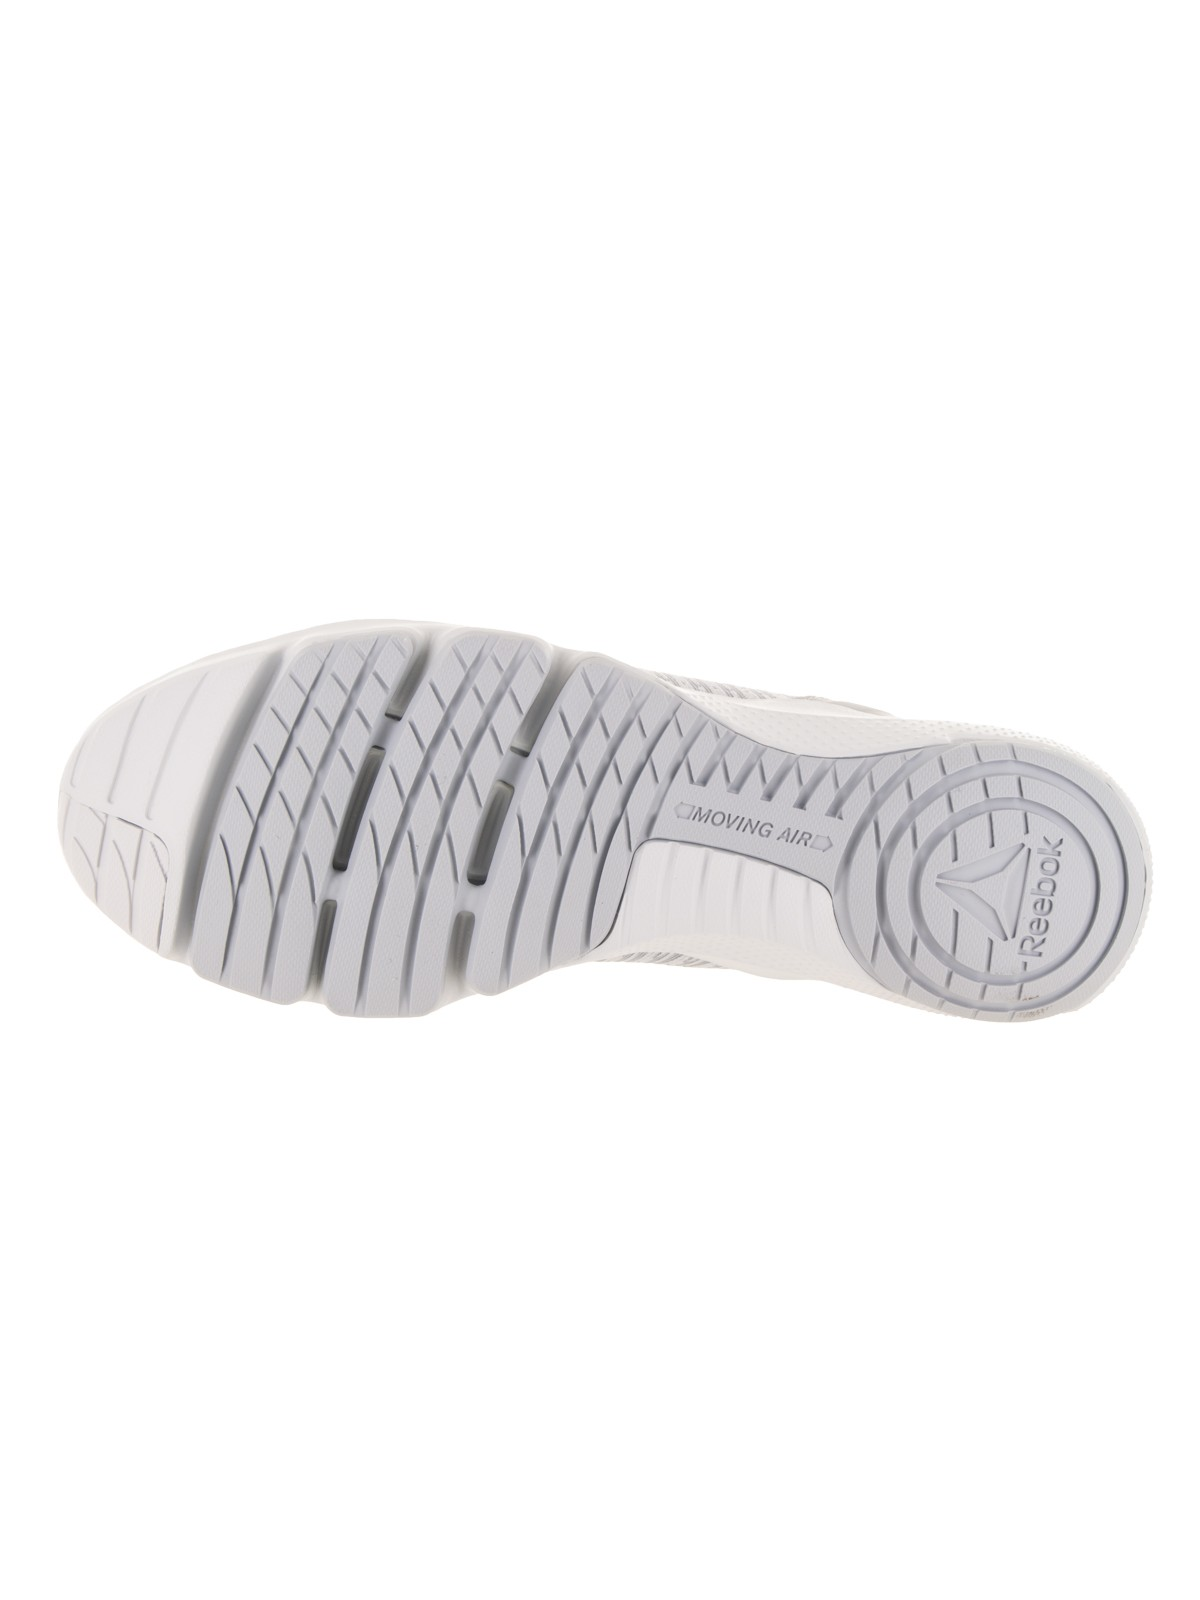 197a030906a1 Reebok Women s Cloudride DMX 3.0 Training Shoe